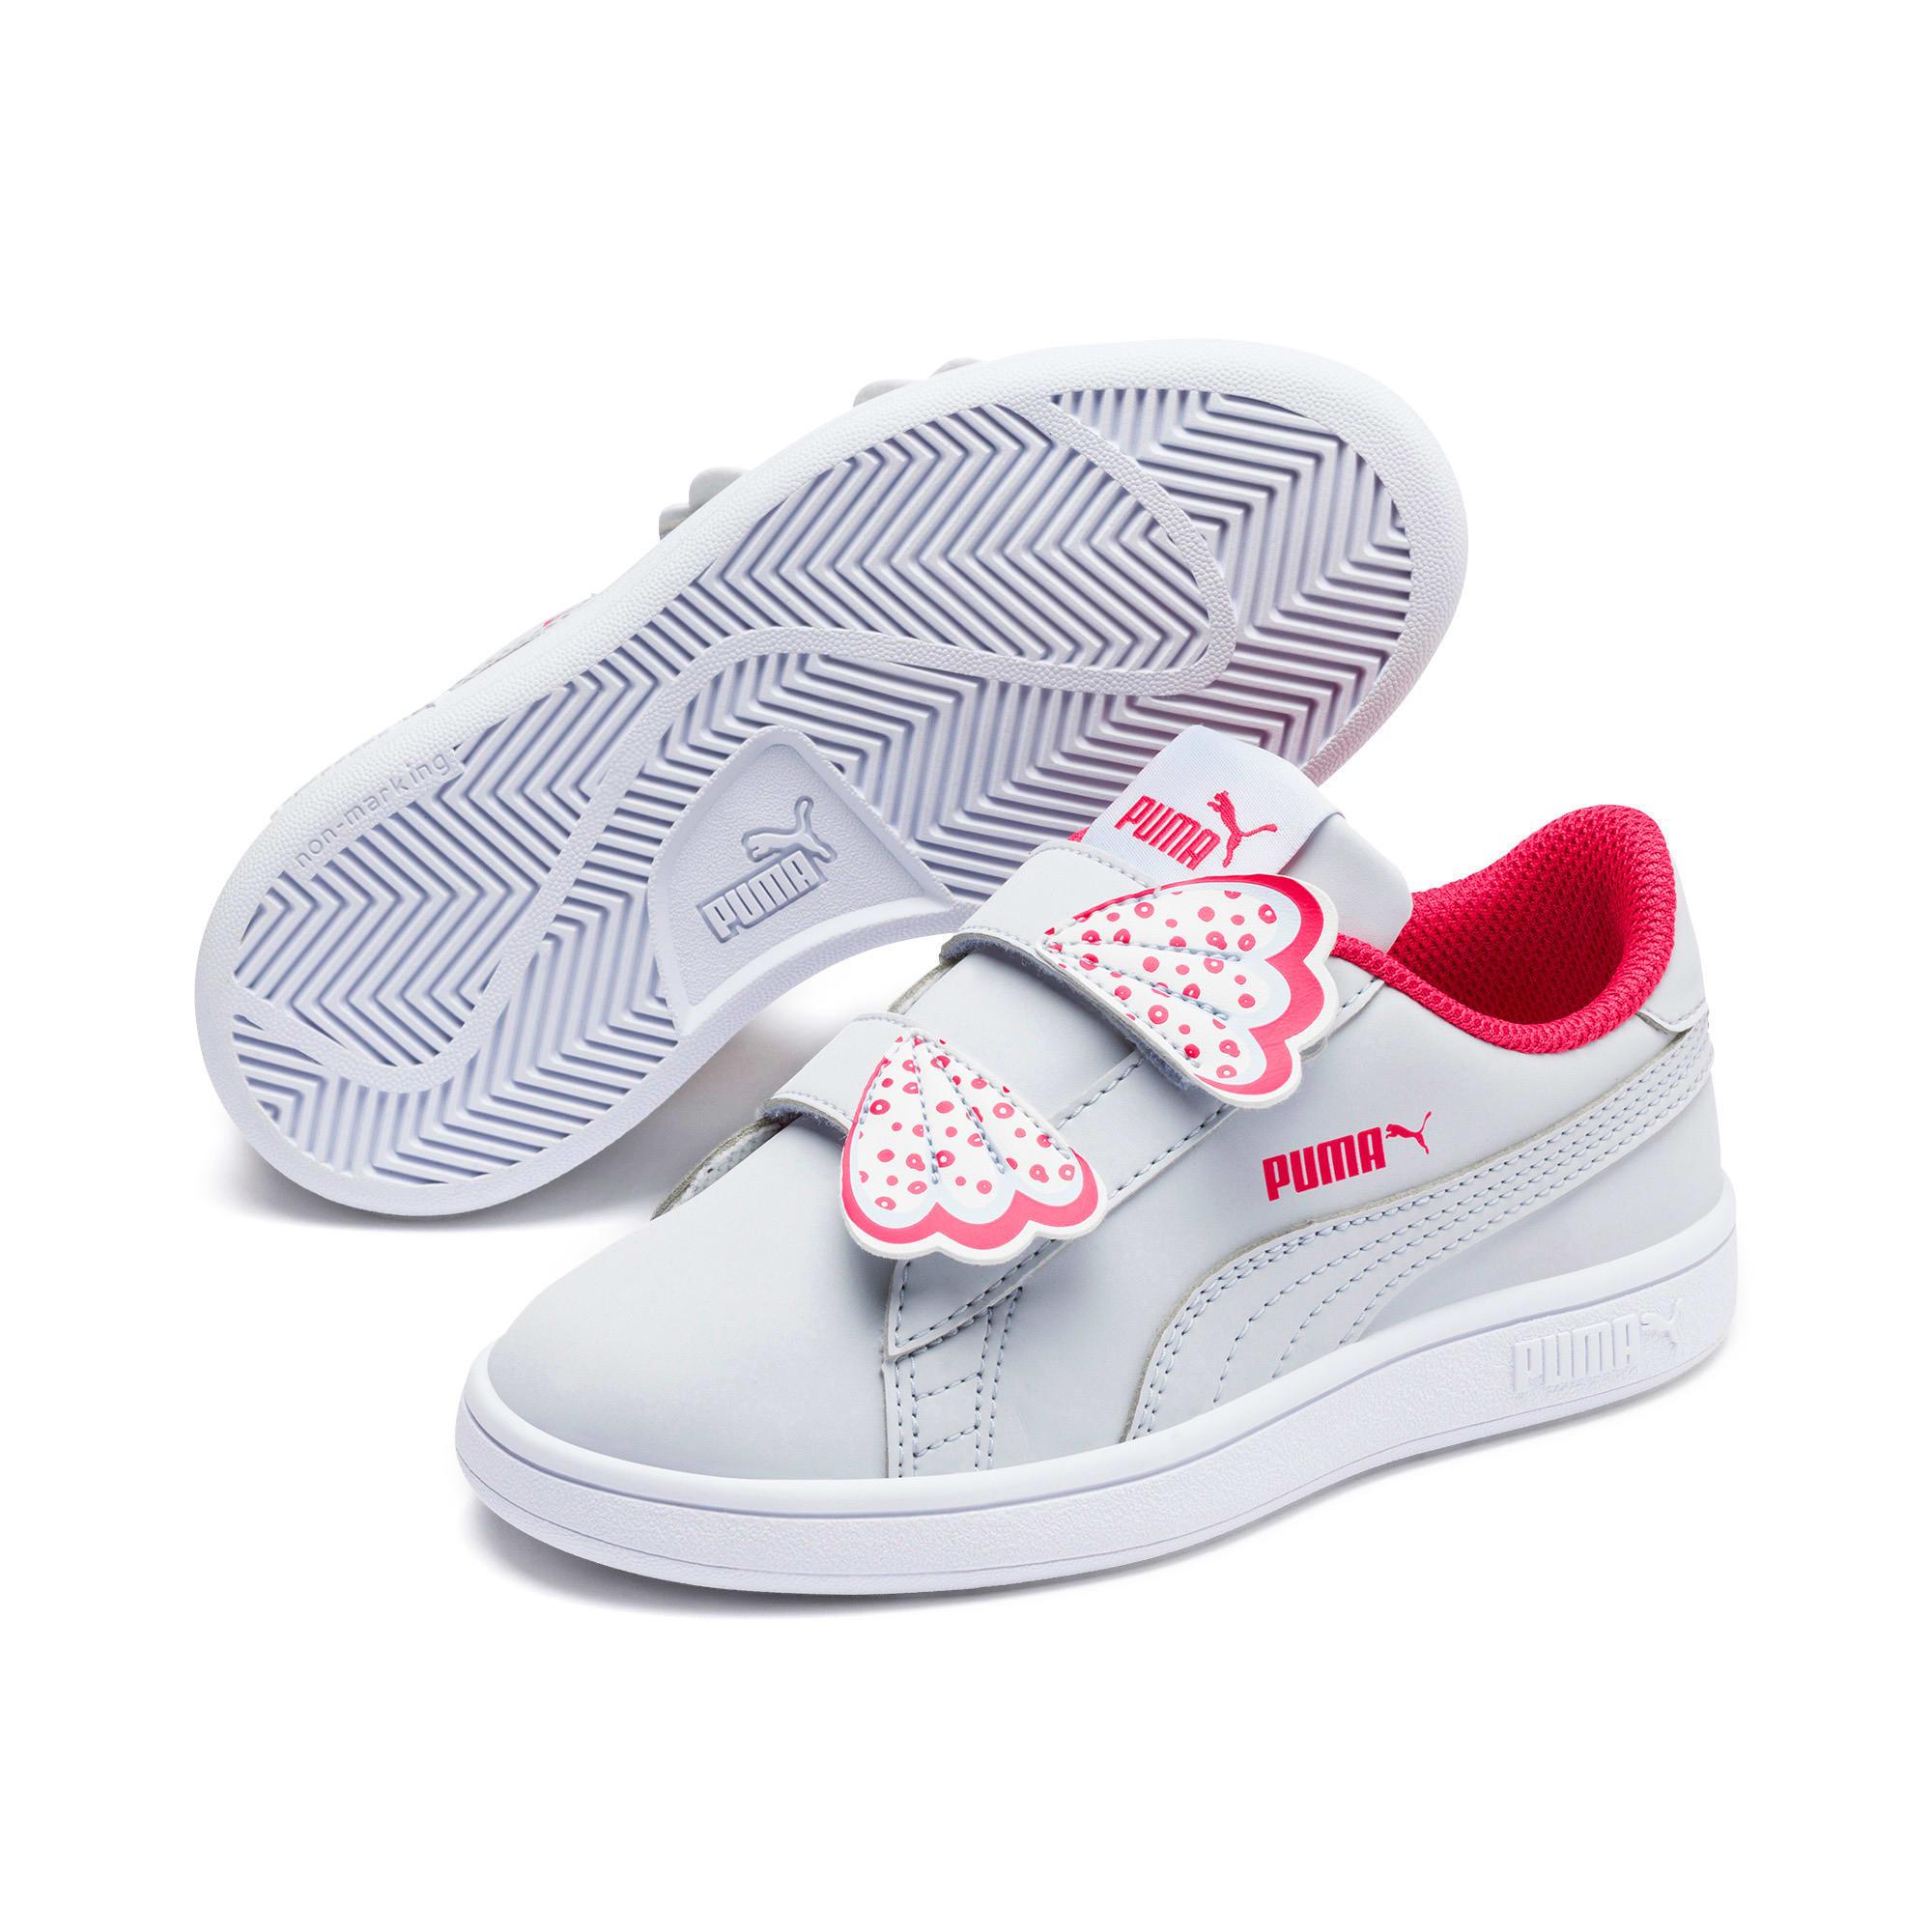 Thumbnail 2 of Puma Smash v2 Butterfly Little Kids' Shoes, Heather-Nrgy Rose-Puma White, medium